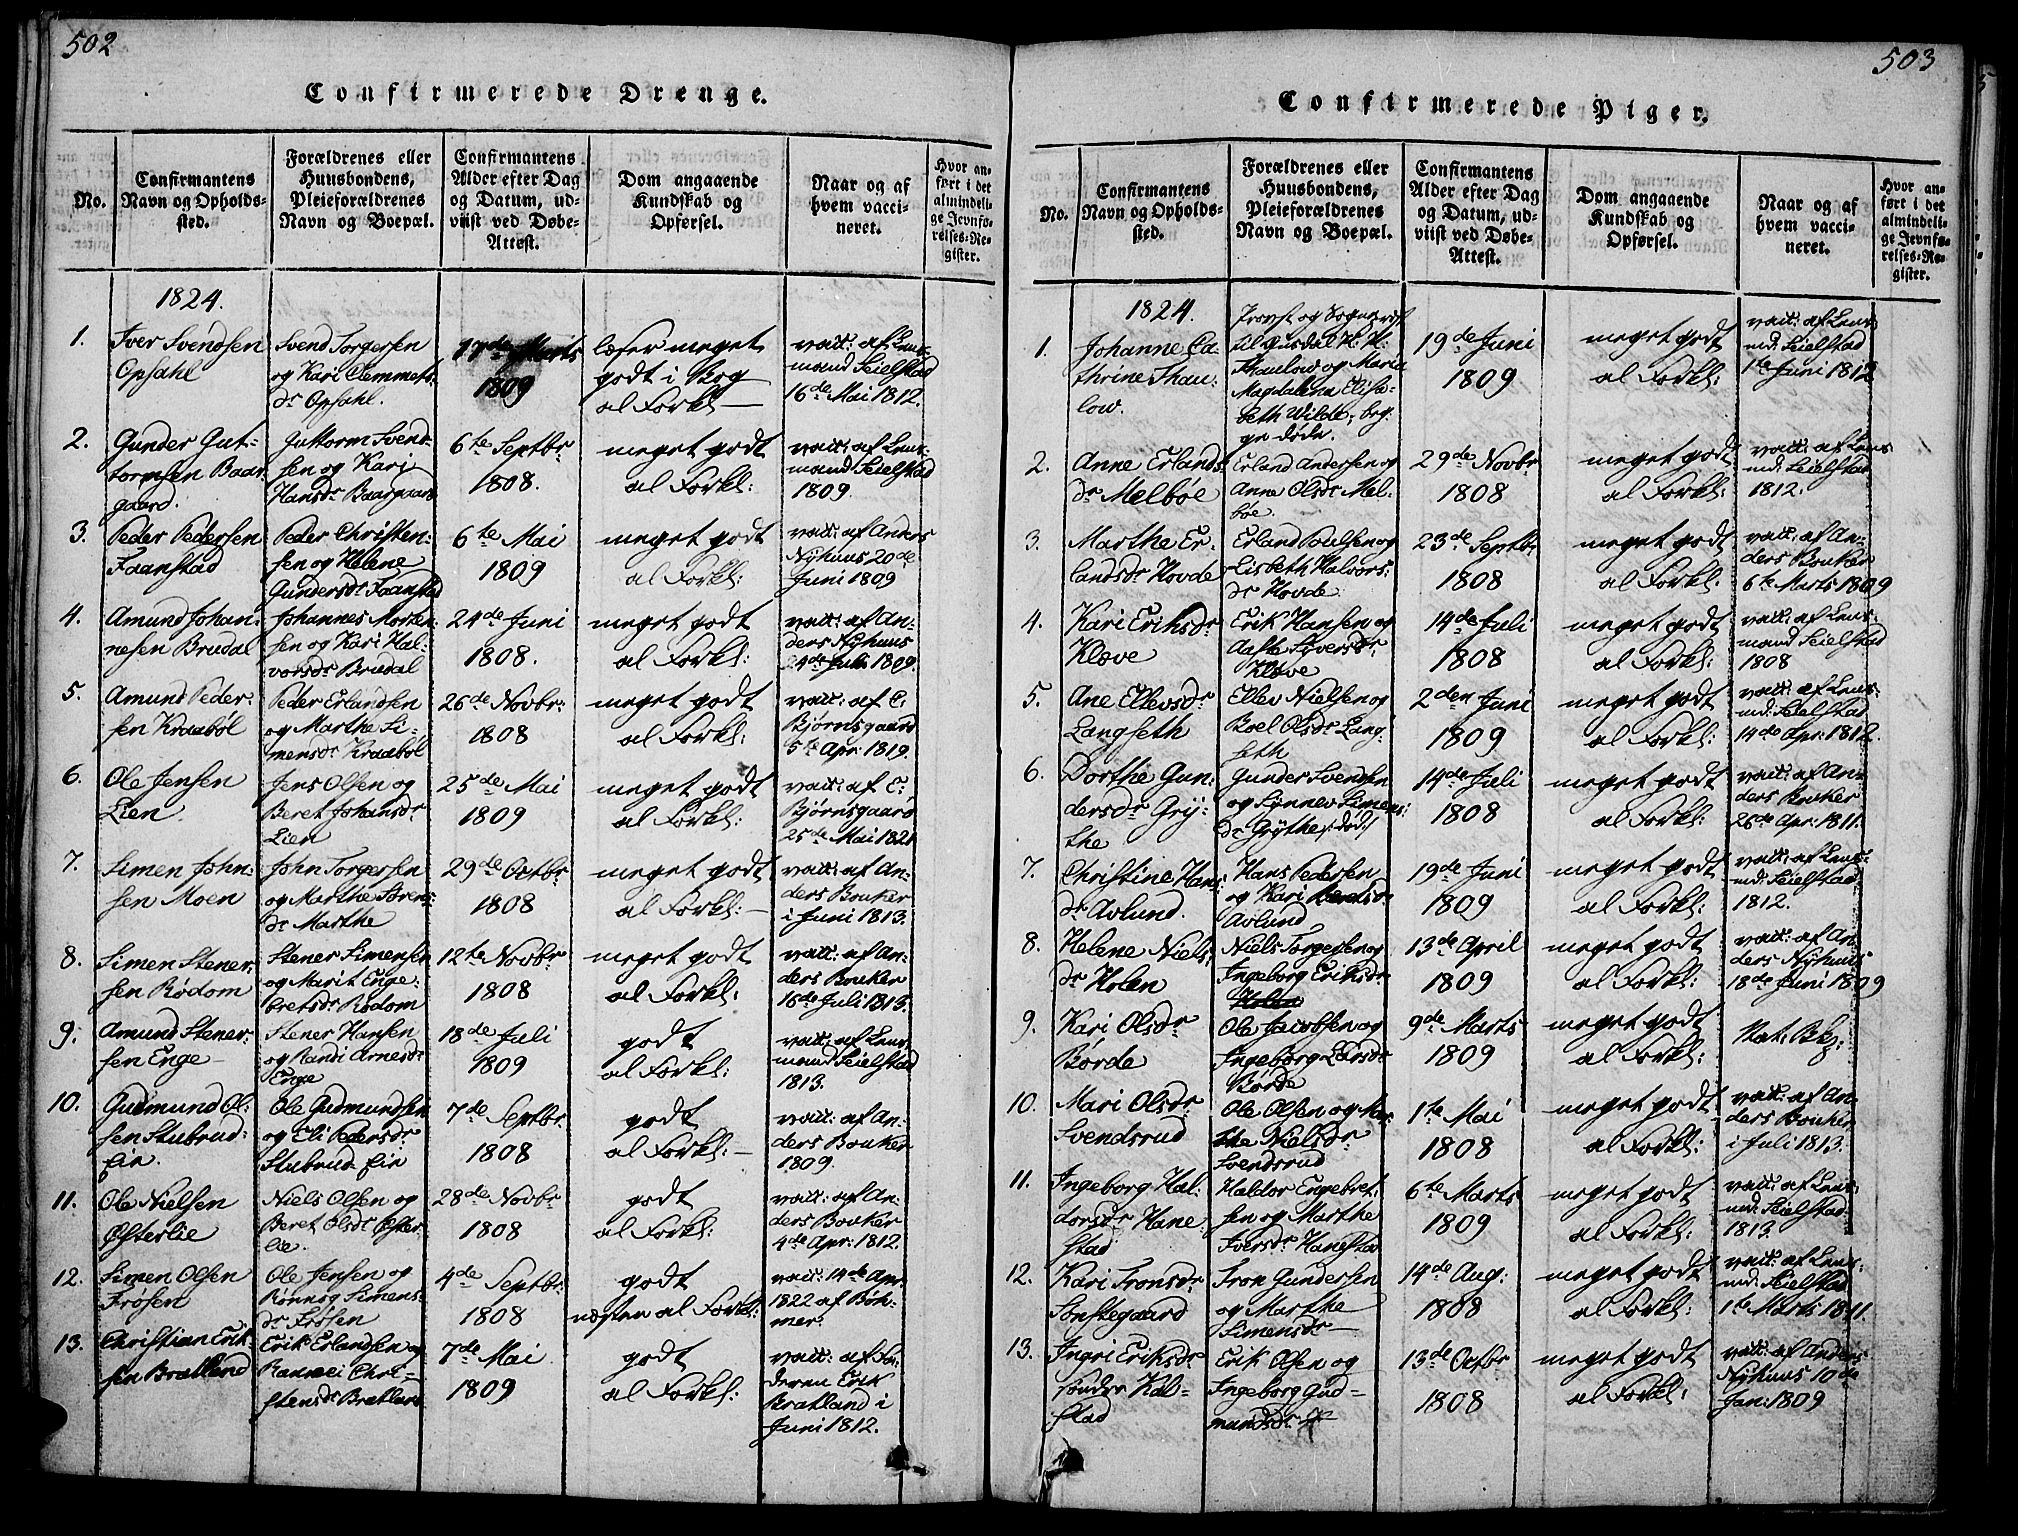 SAH, Gausdal prestekontor, Ministerialbok nr. 5, 1817-1829, s. 502-503